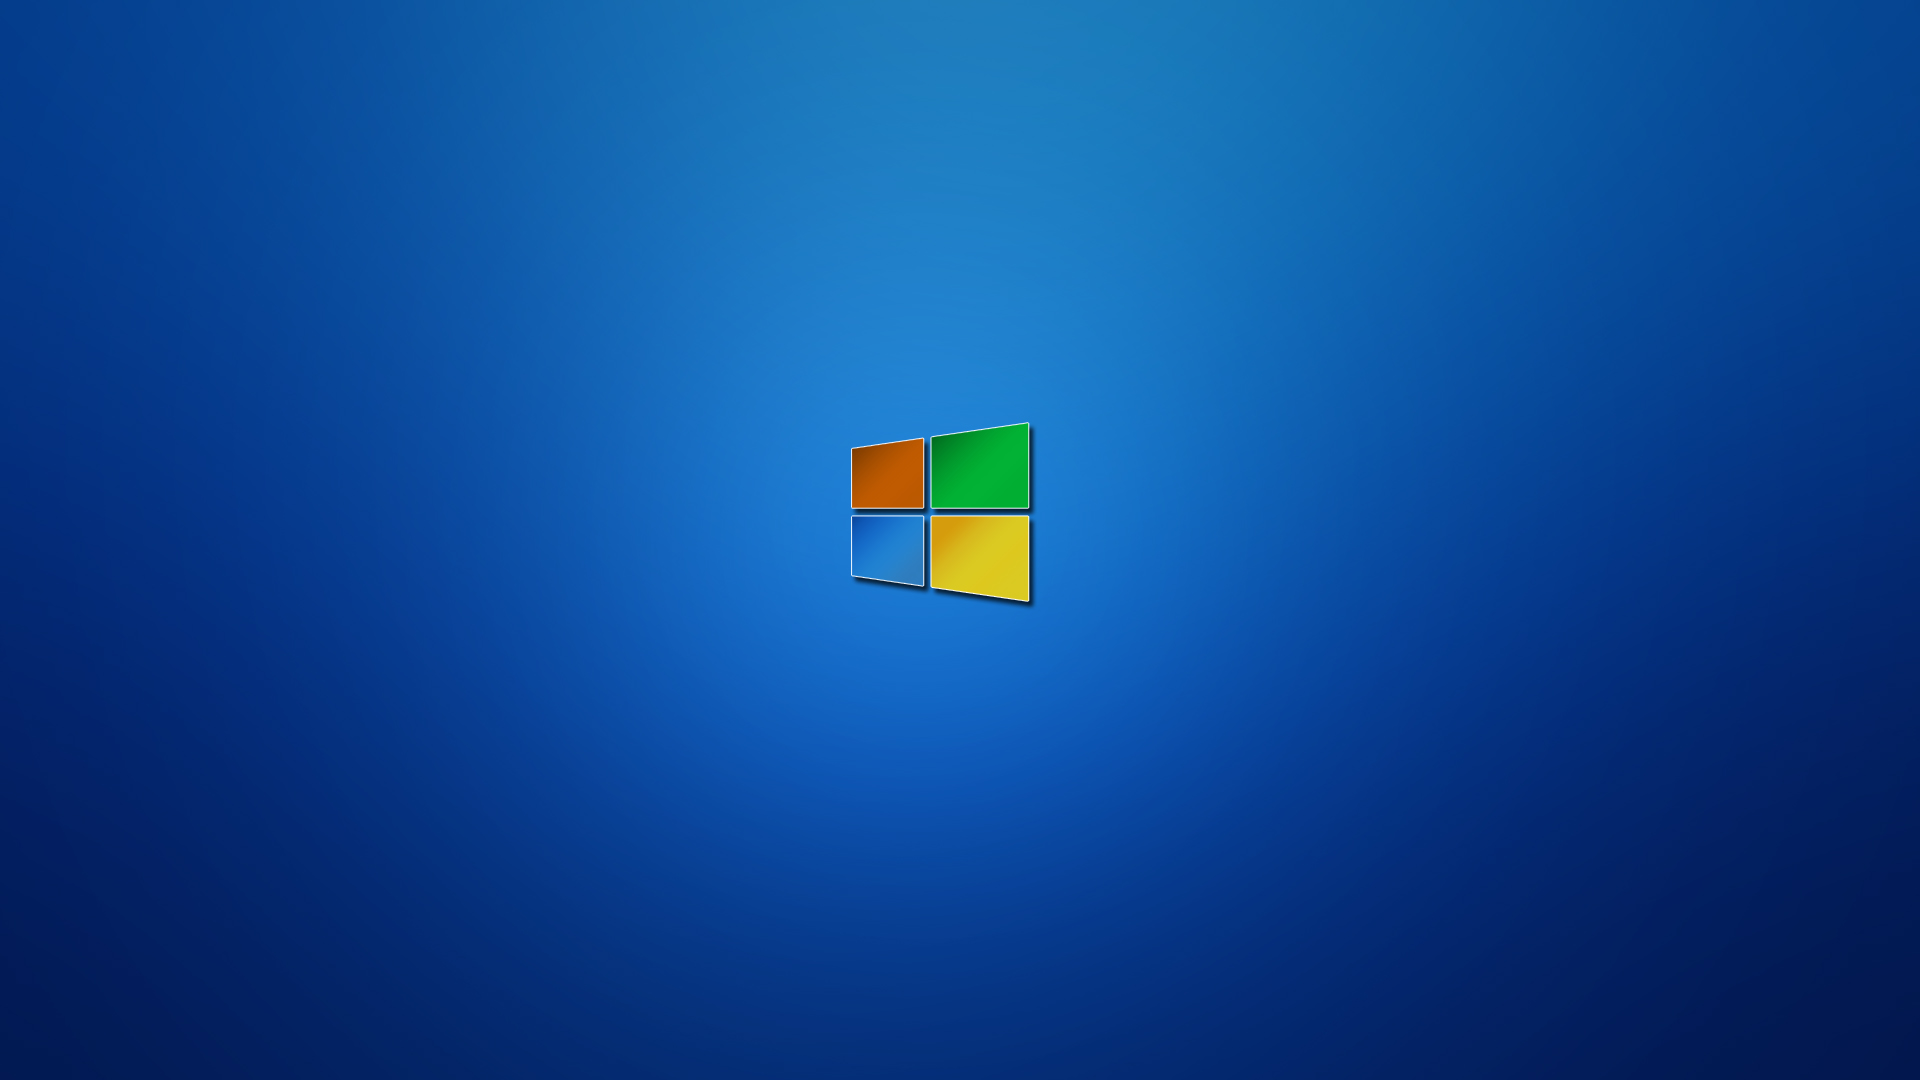 Windows-Blue-by-darius-on-DeviantArt-wallpaper-wpc58010312